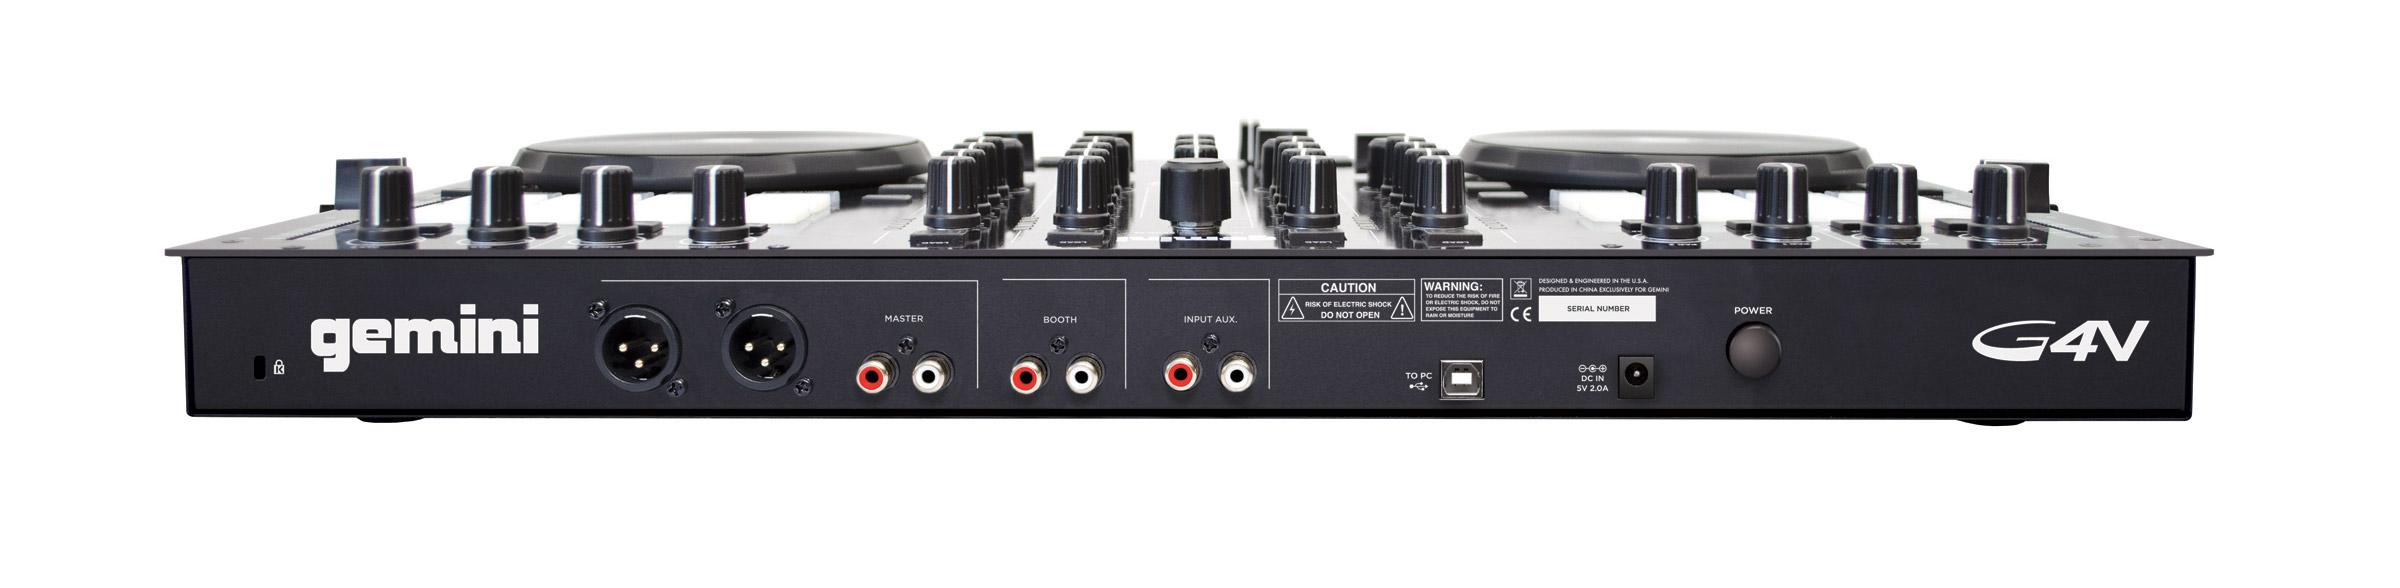 Gemini G4V Controller Review